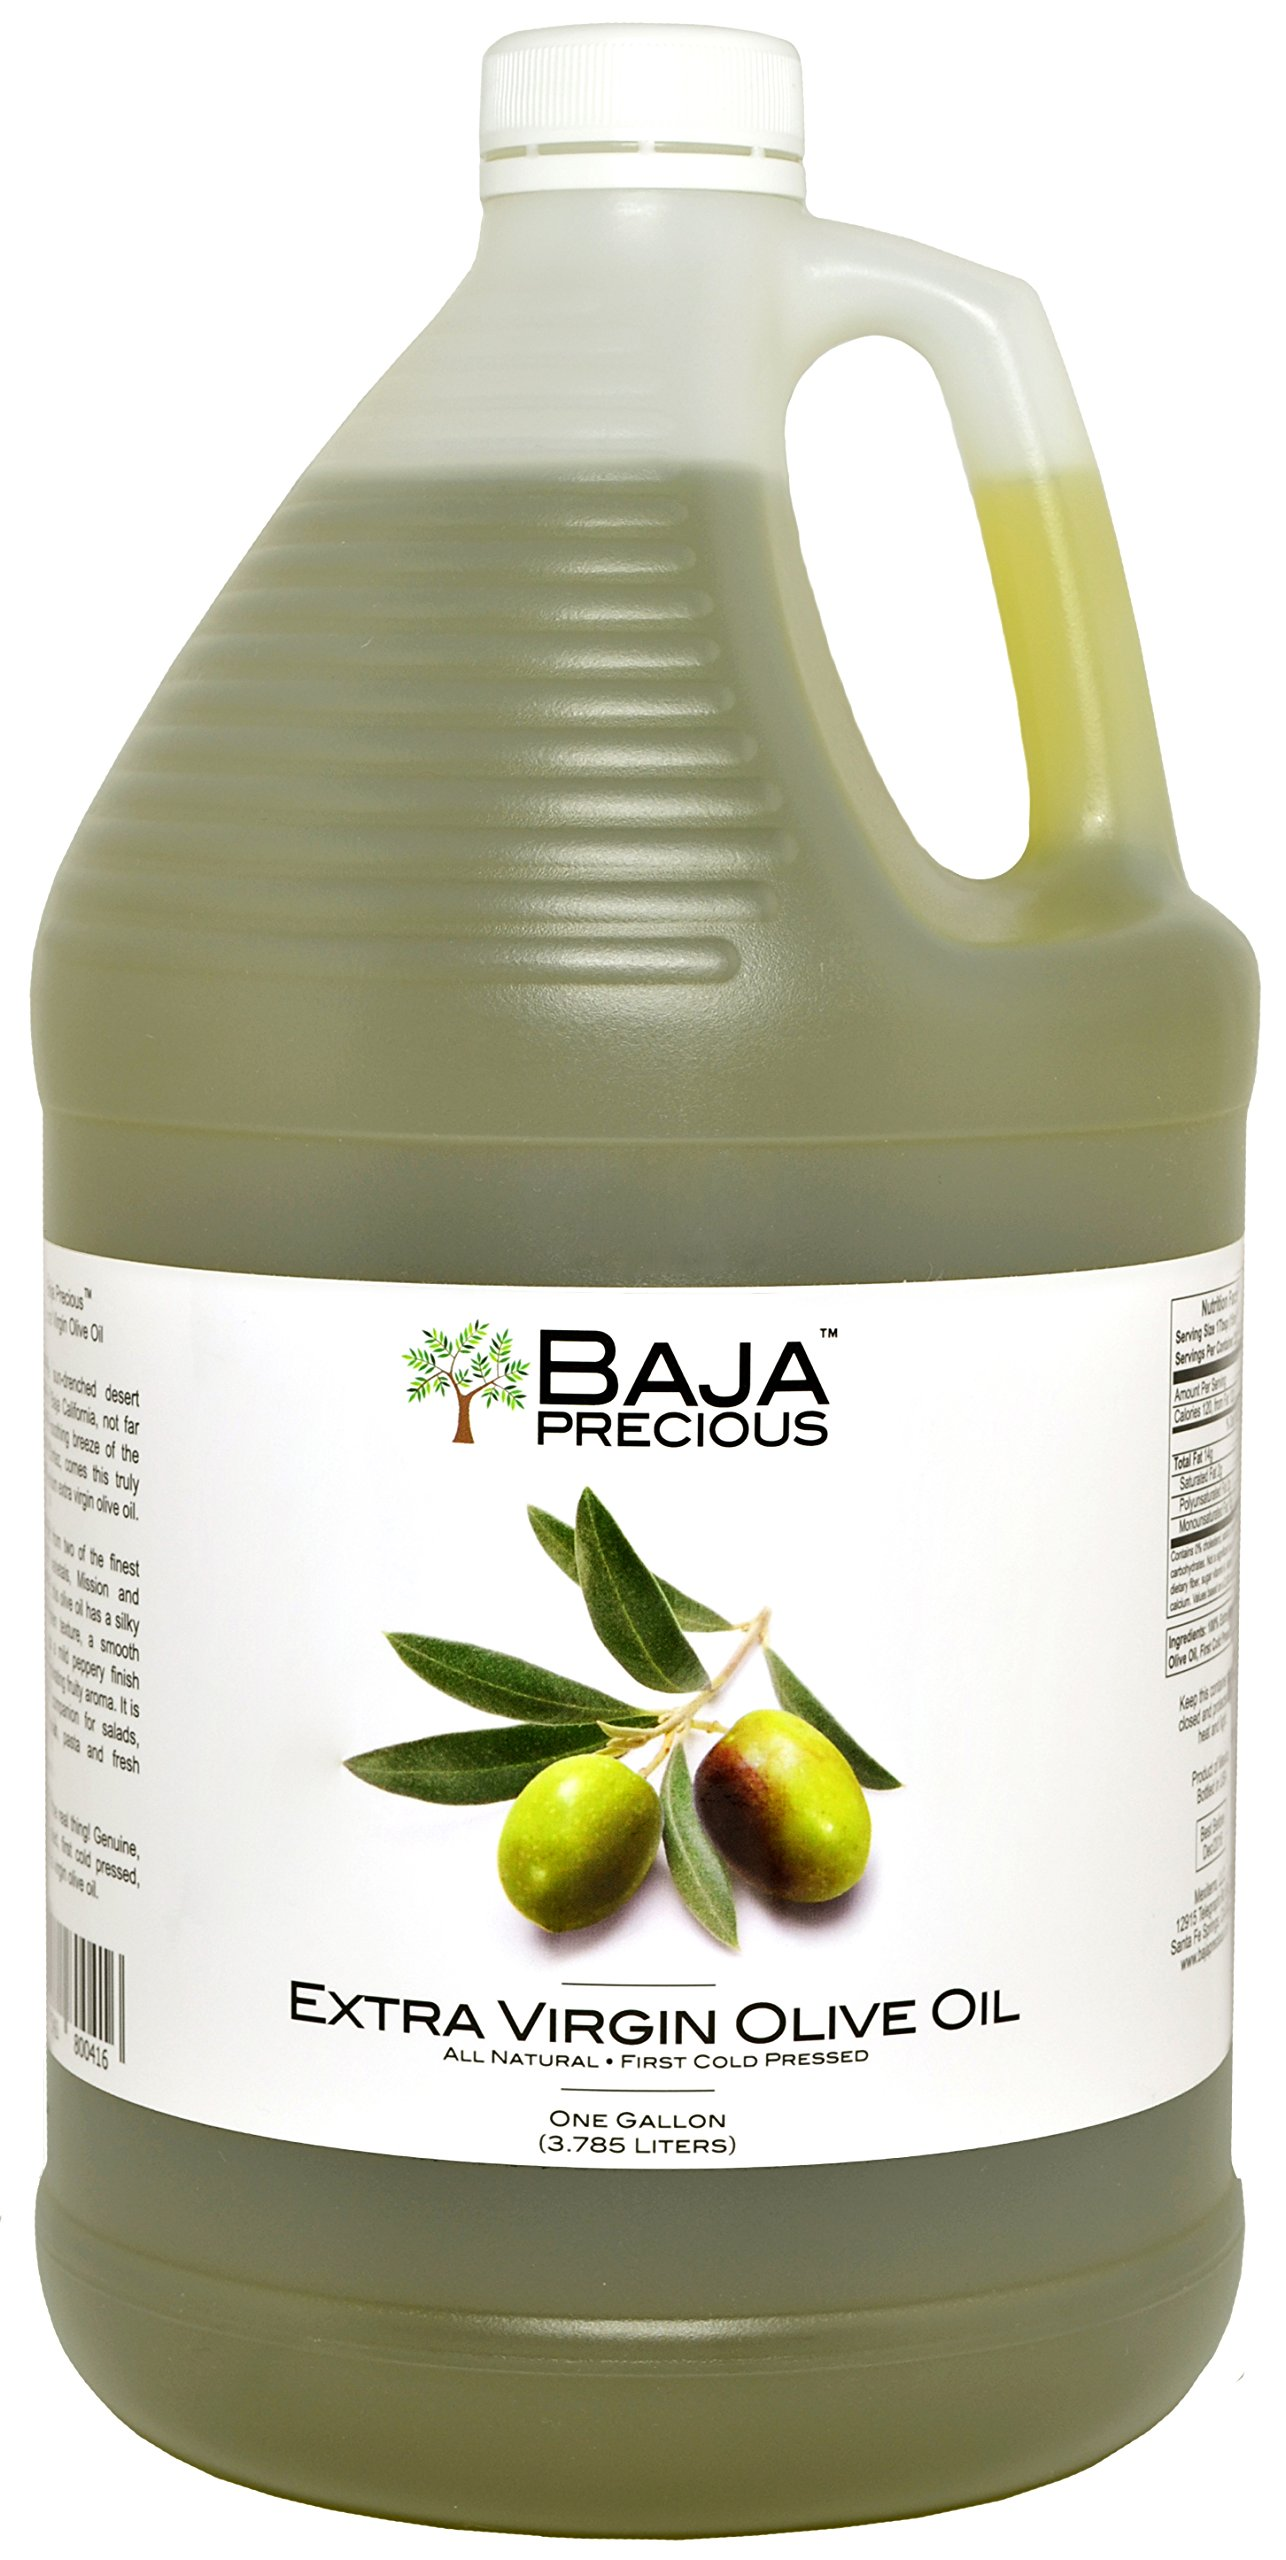 Baja Precious - Extra Virgin Olive Oil, 1 Gallon by Baja Precious